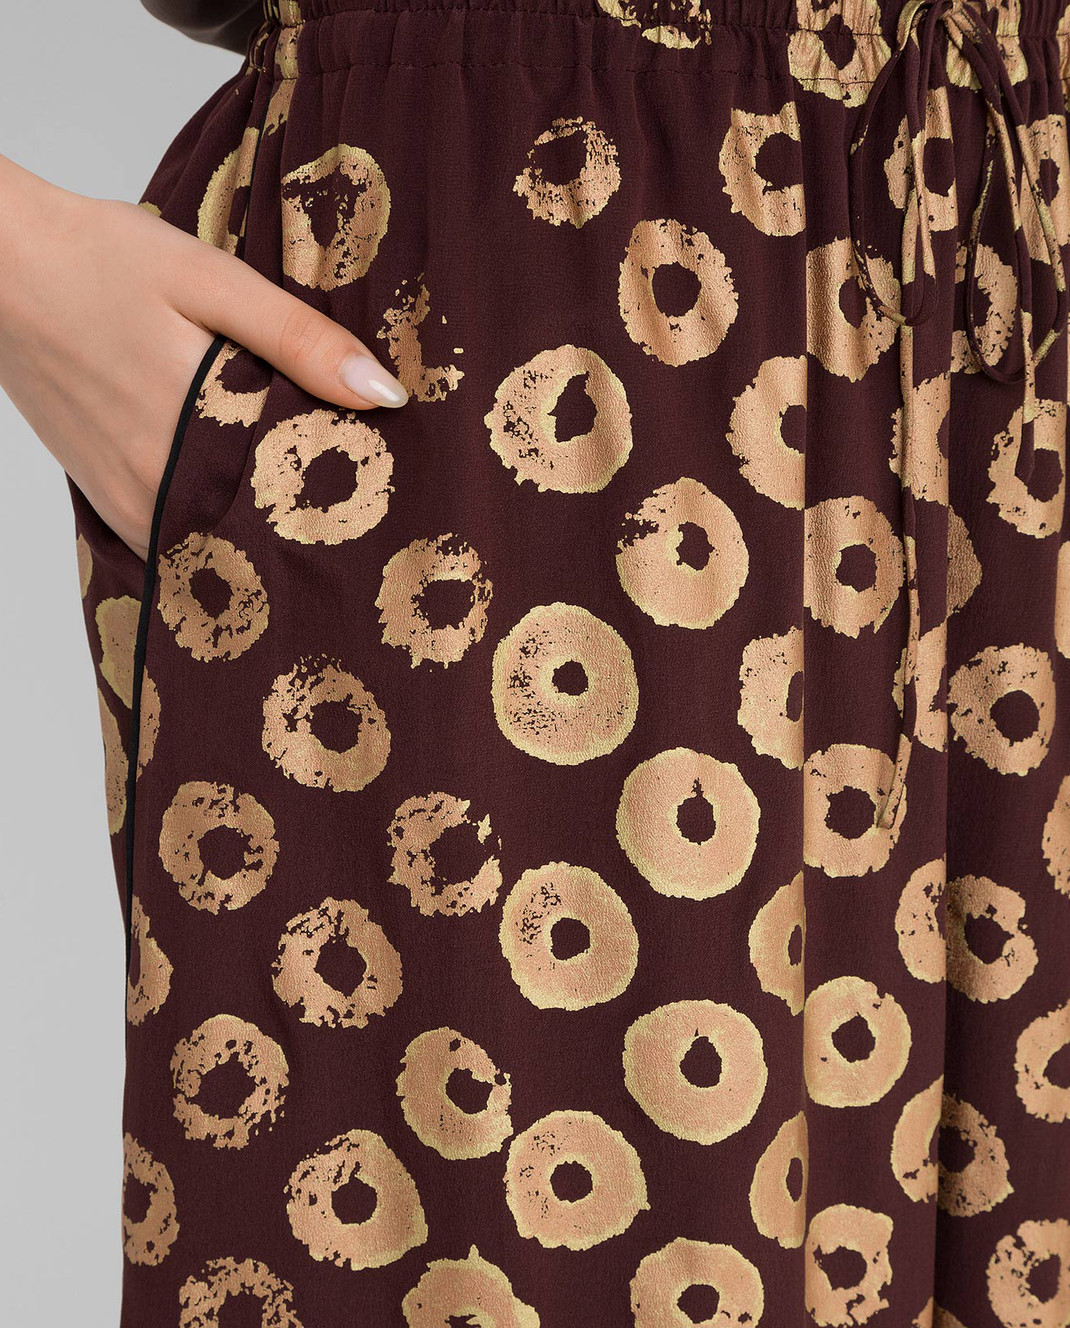 Valentino Коричневая юбка из шелка KB0RA1D12JC изображение 5